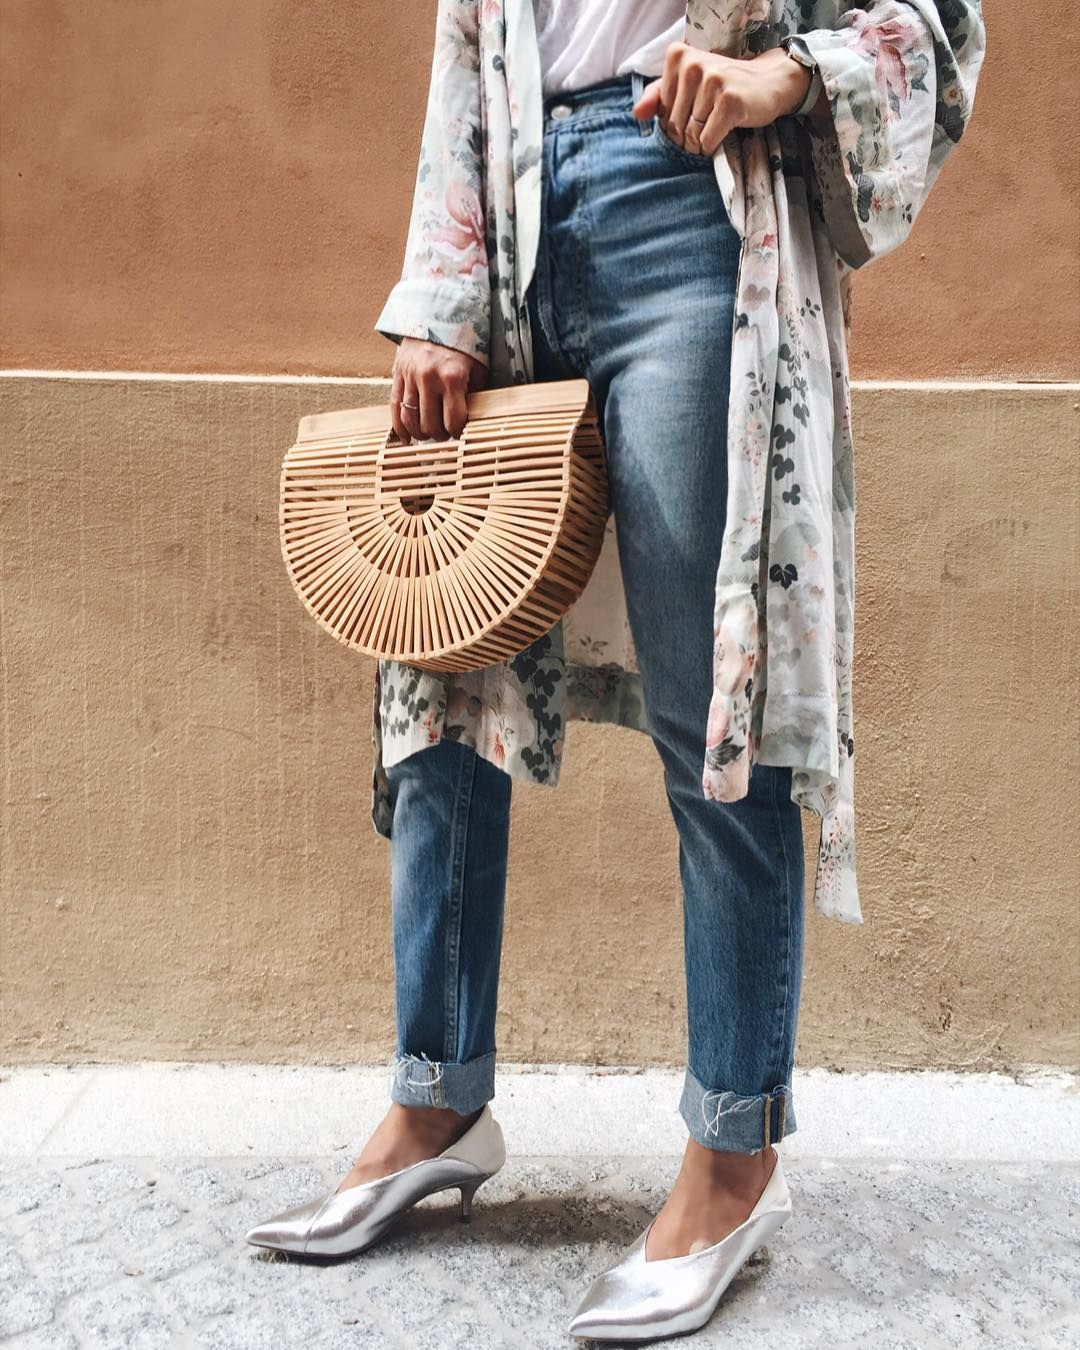 T Bag Gaia Small Shoes Jeans White Silver Denim Kimono Cult Straw vaFnwpgxq